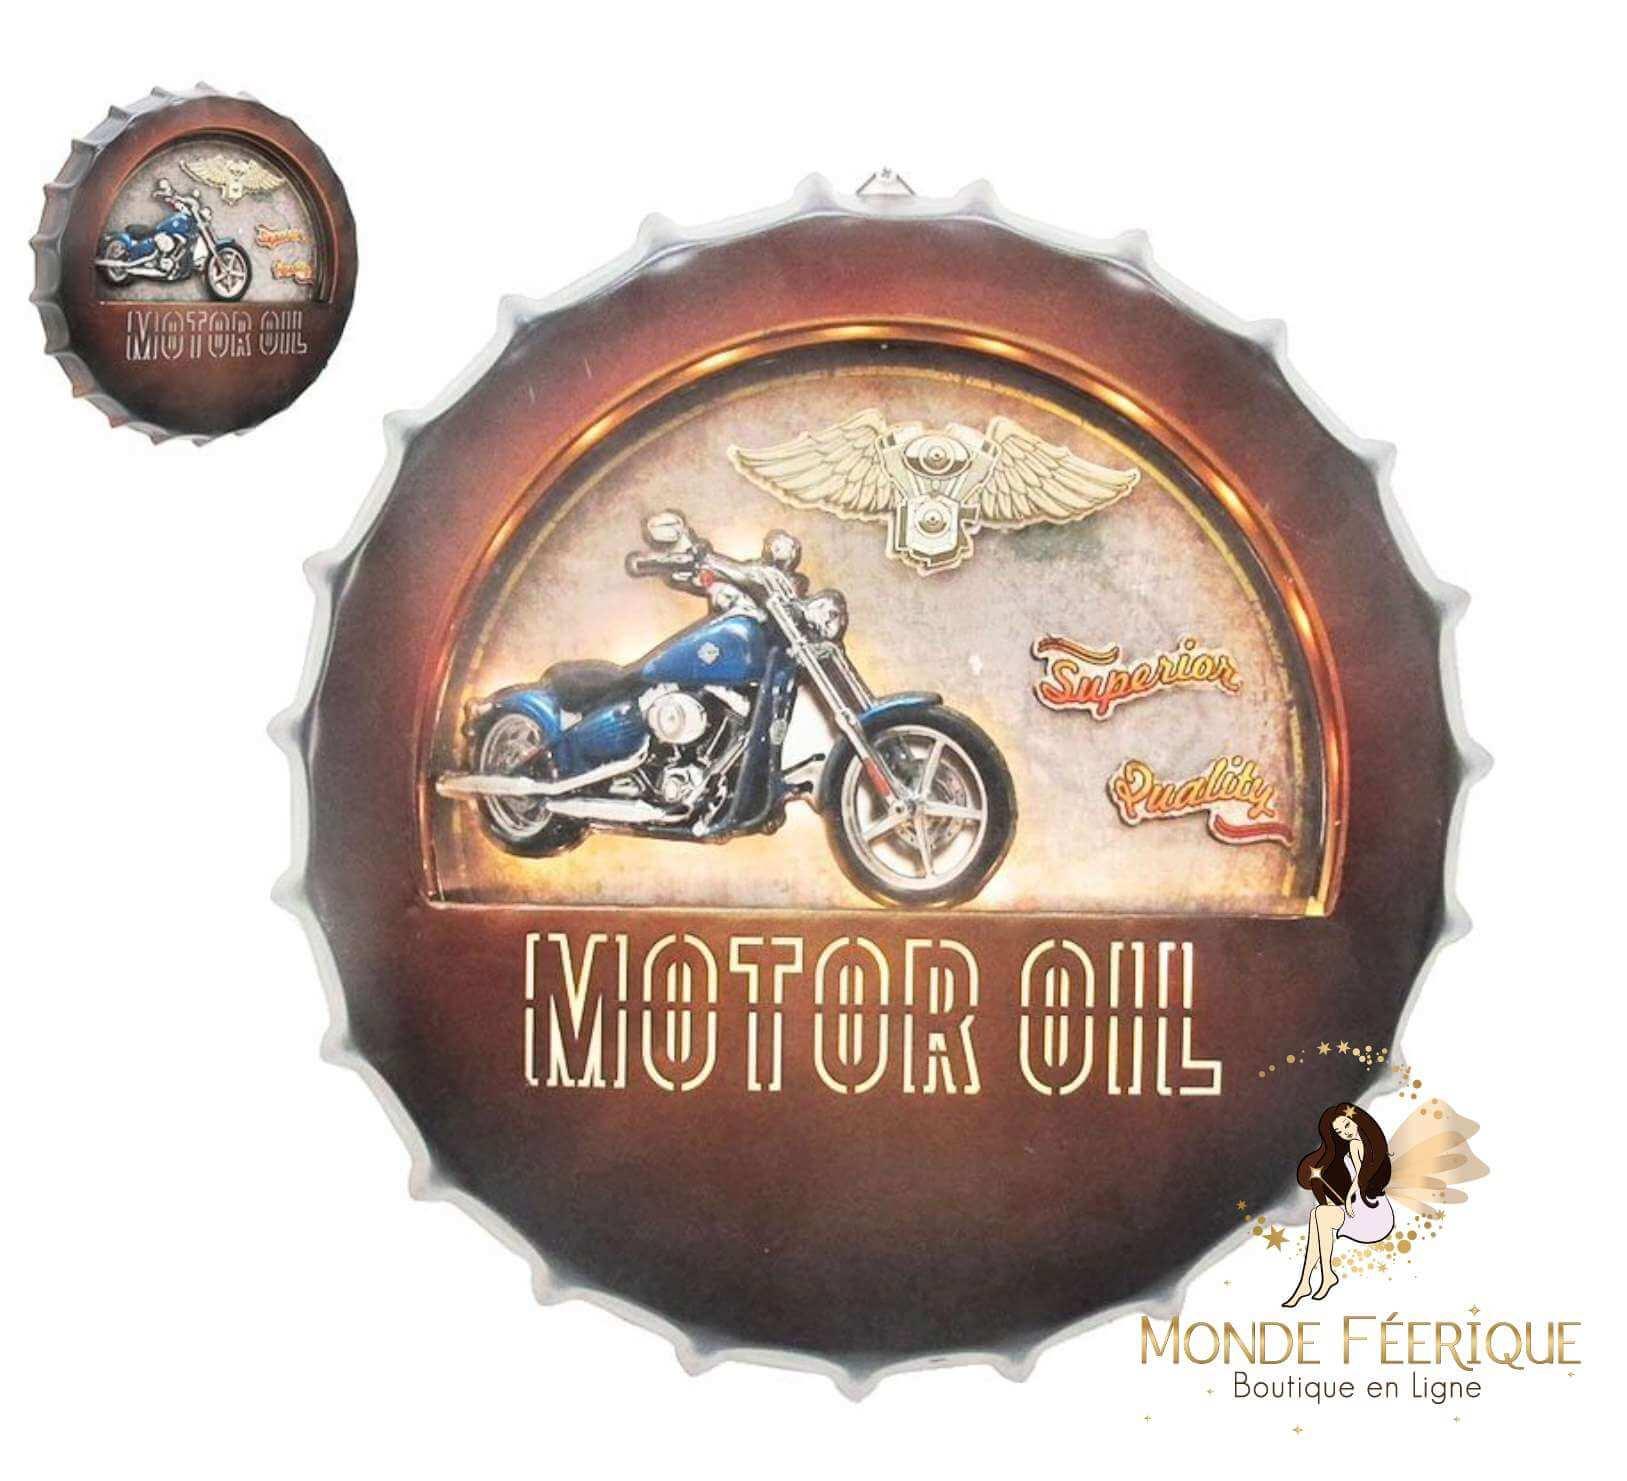 Capsule Moto Vintage 42 cm LED Lumineux